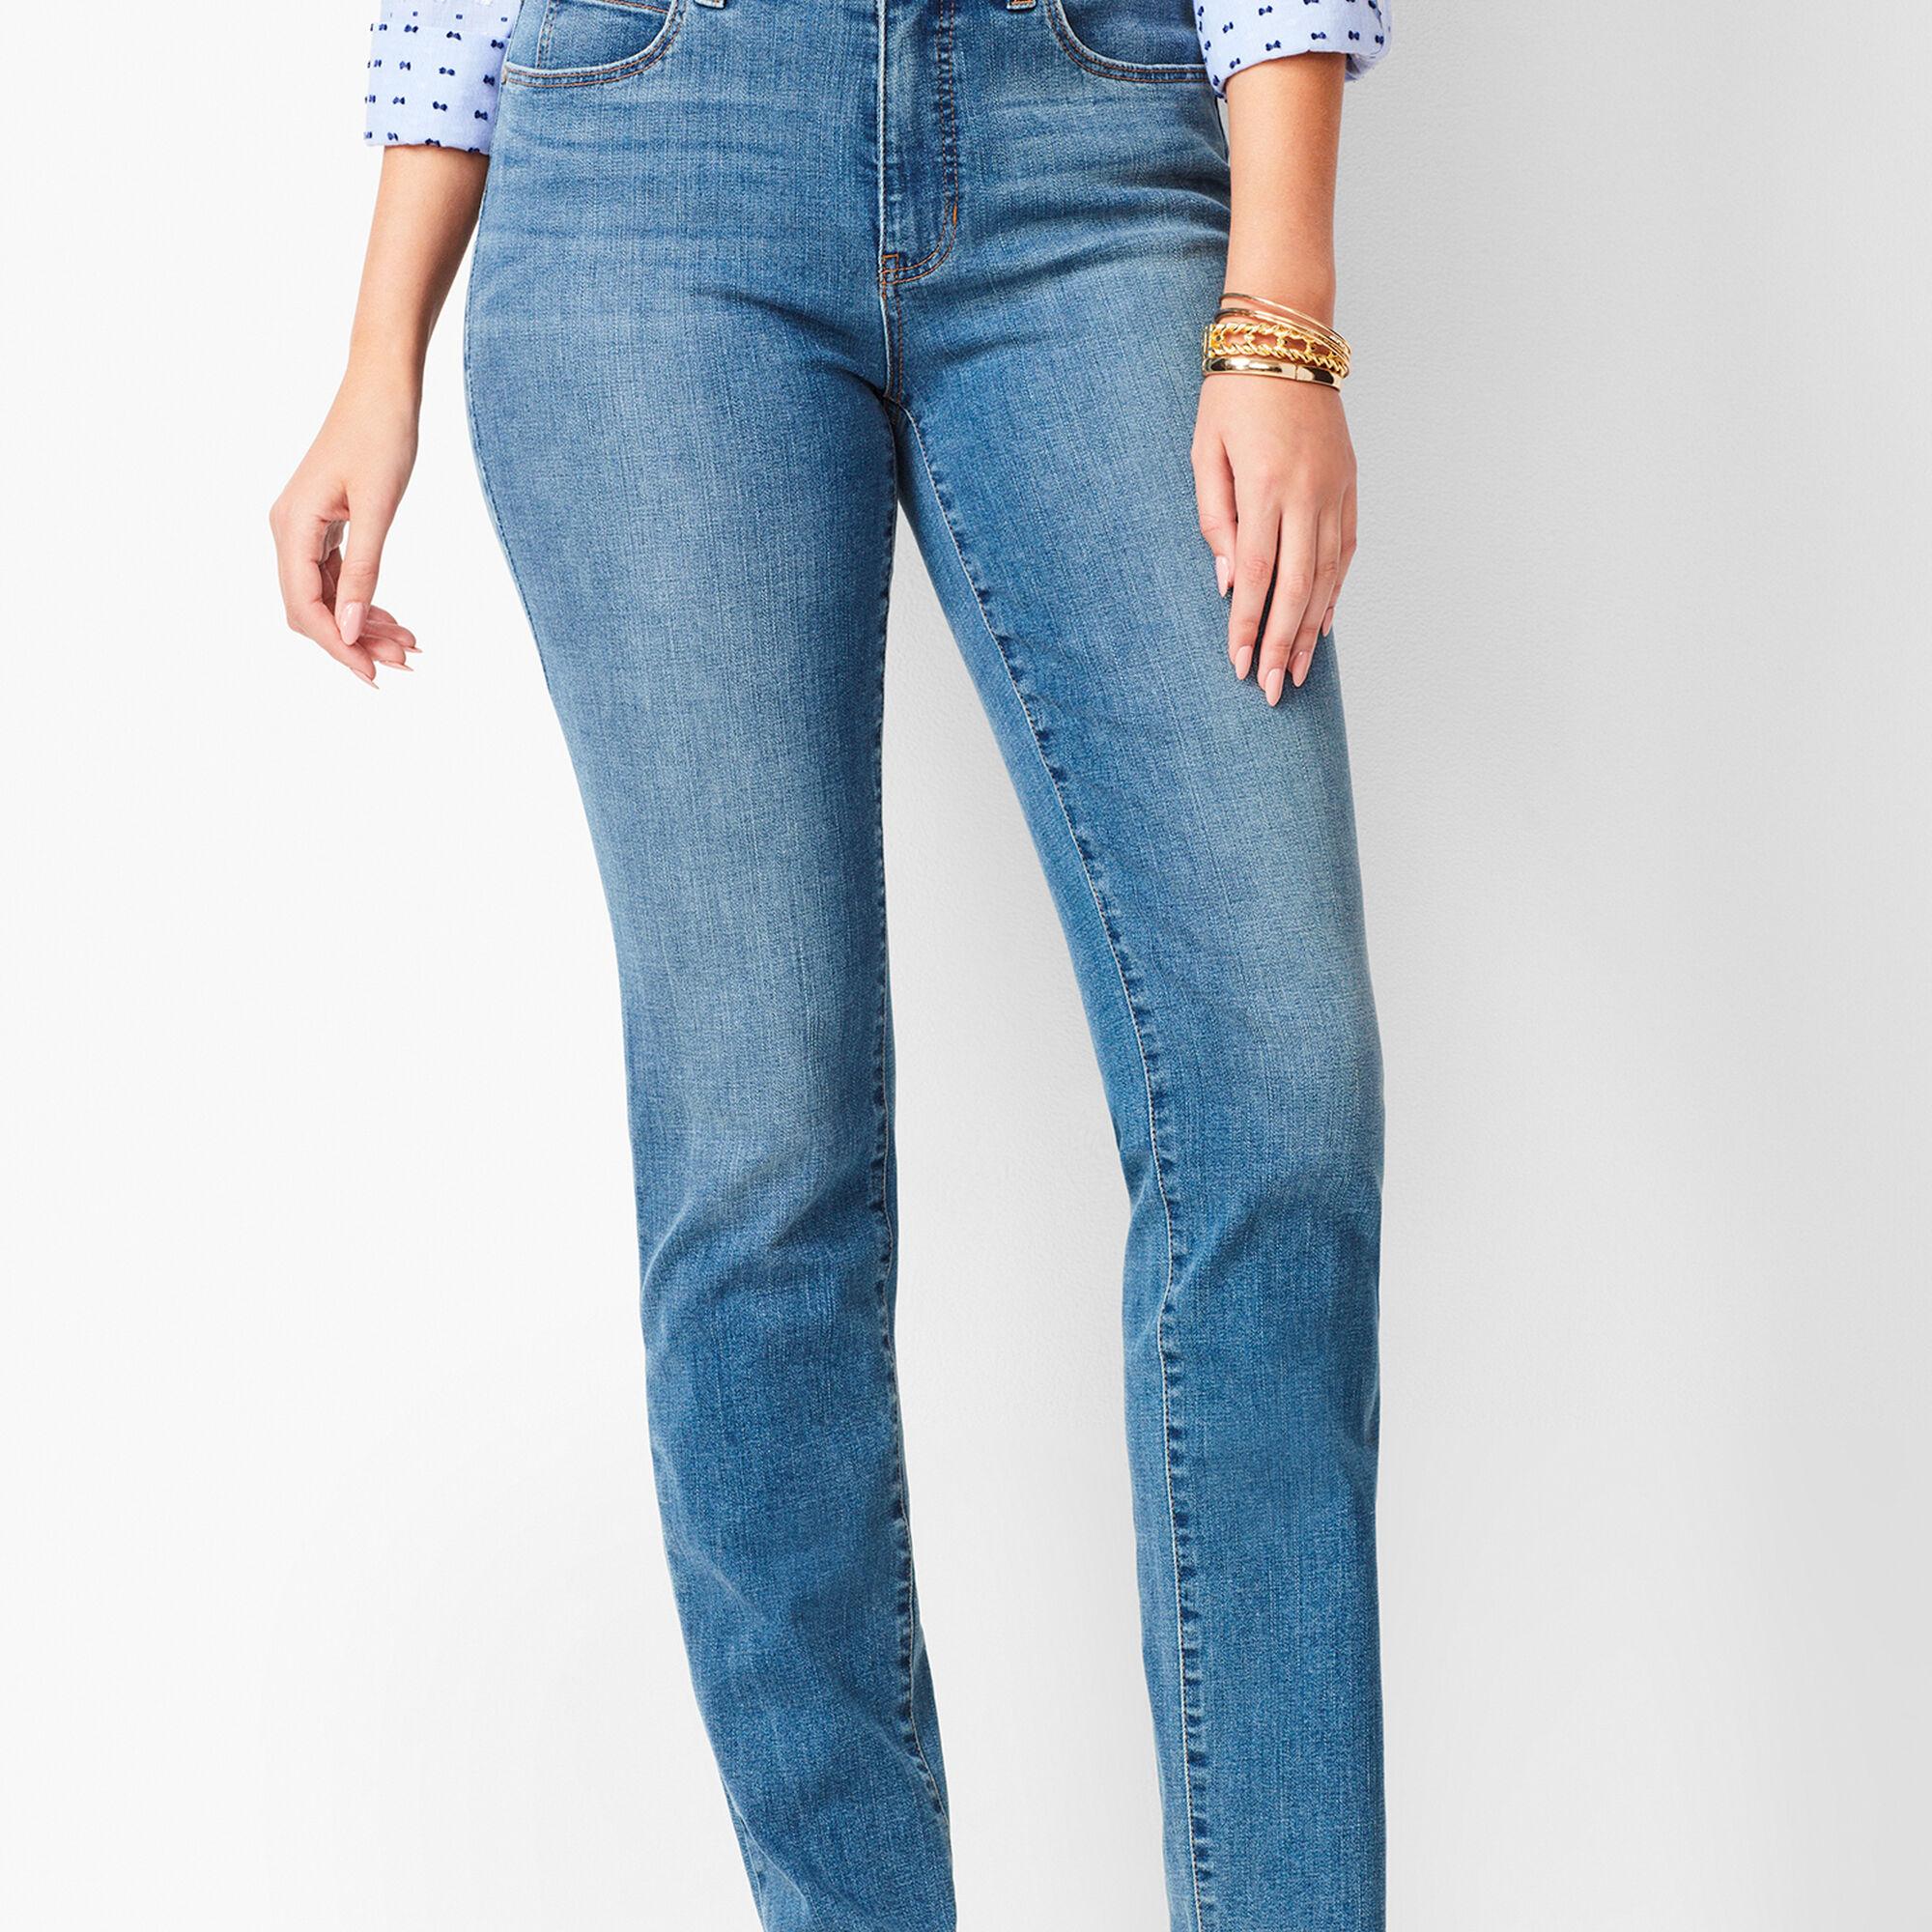 5b9d66edc2f22 Images. High-Waist Straight-Leg Jeans - Curvy Fit - Aurora Wash